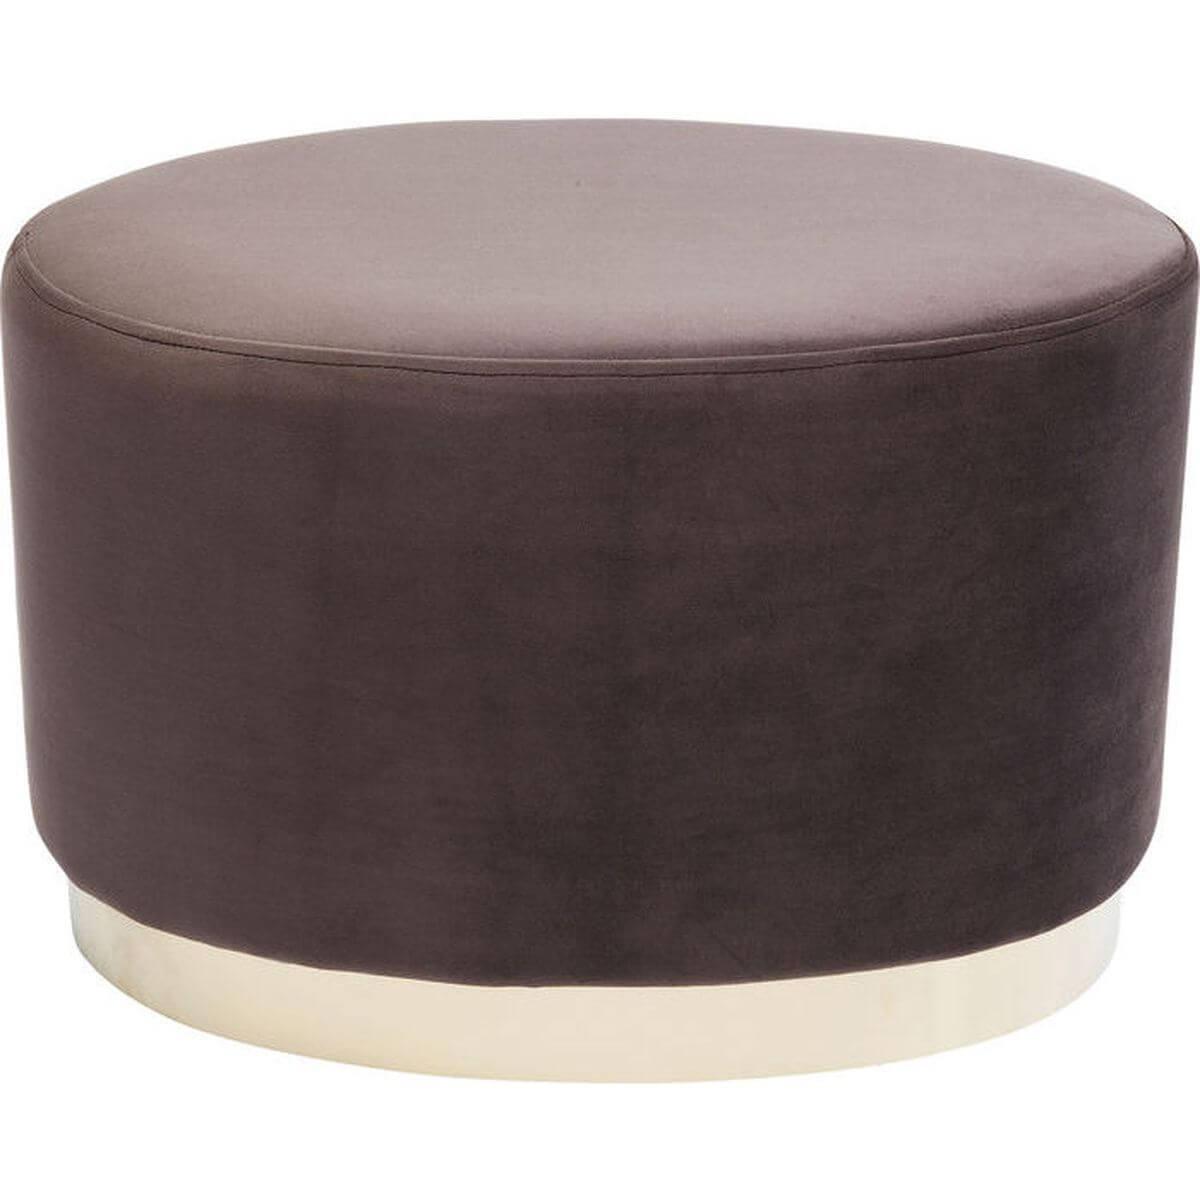 Tabouret CHERRY ECLIPSE Kare Design marron/laiton